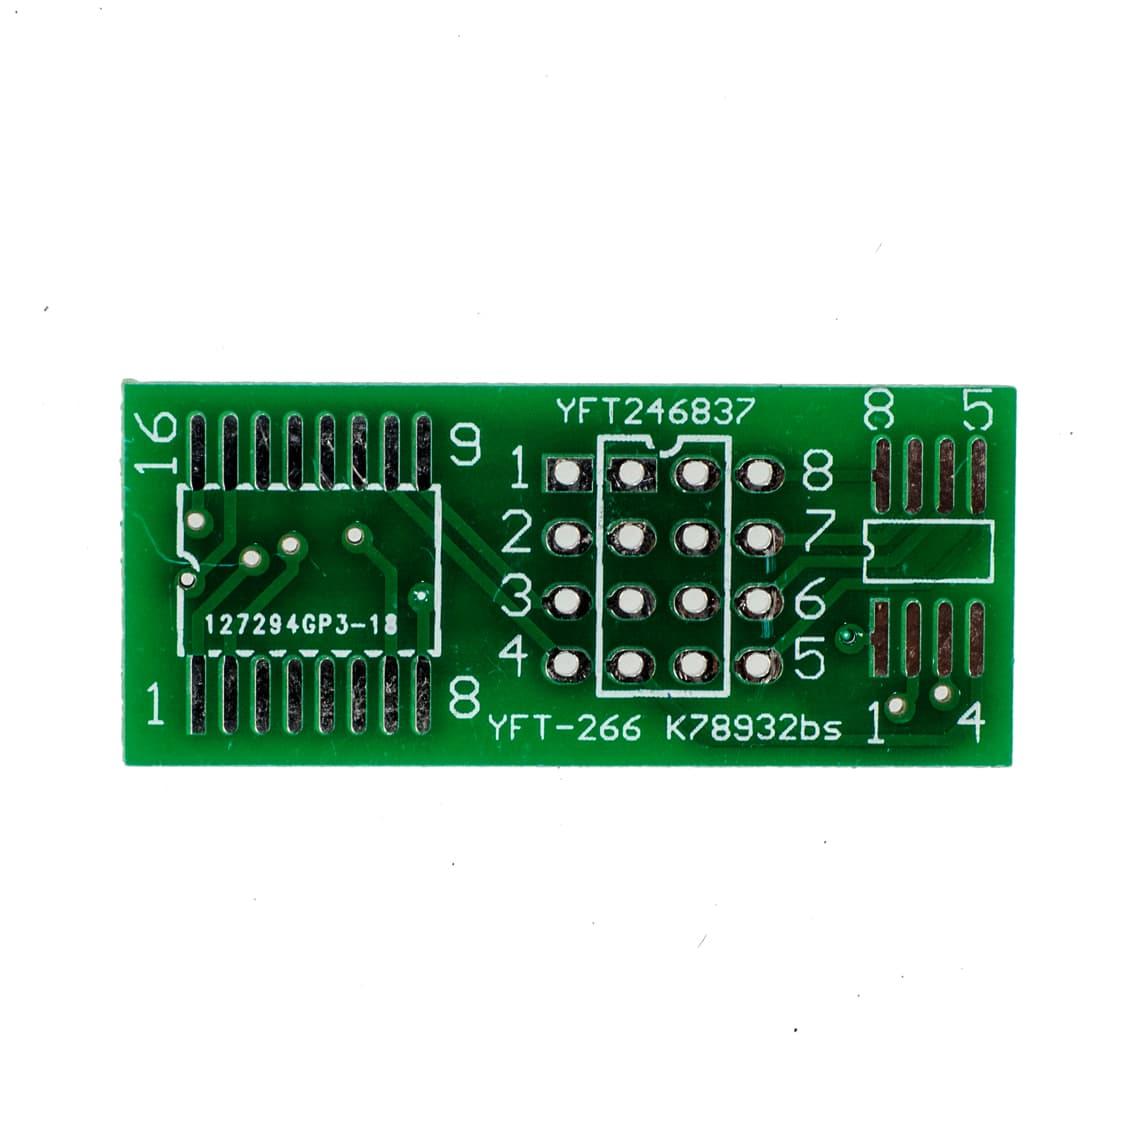 CH341A 24 25 Series EEPROM Flash BIOS USB Programmer - Phipps Electronics